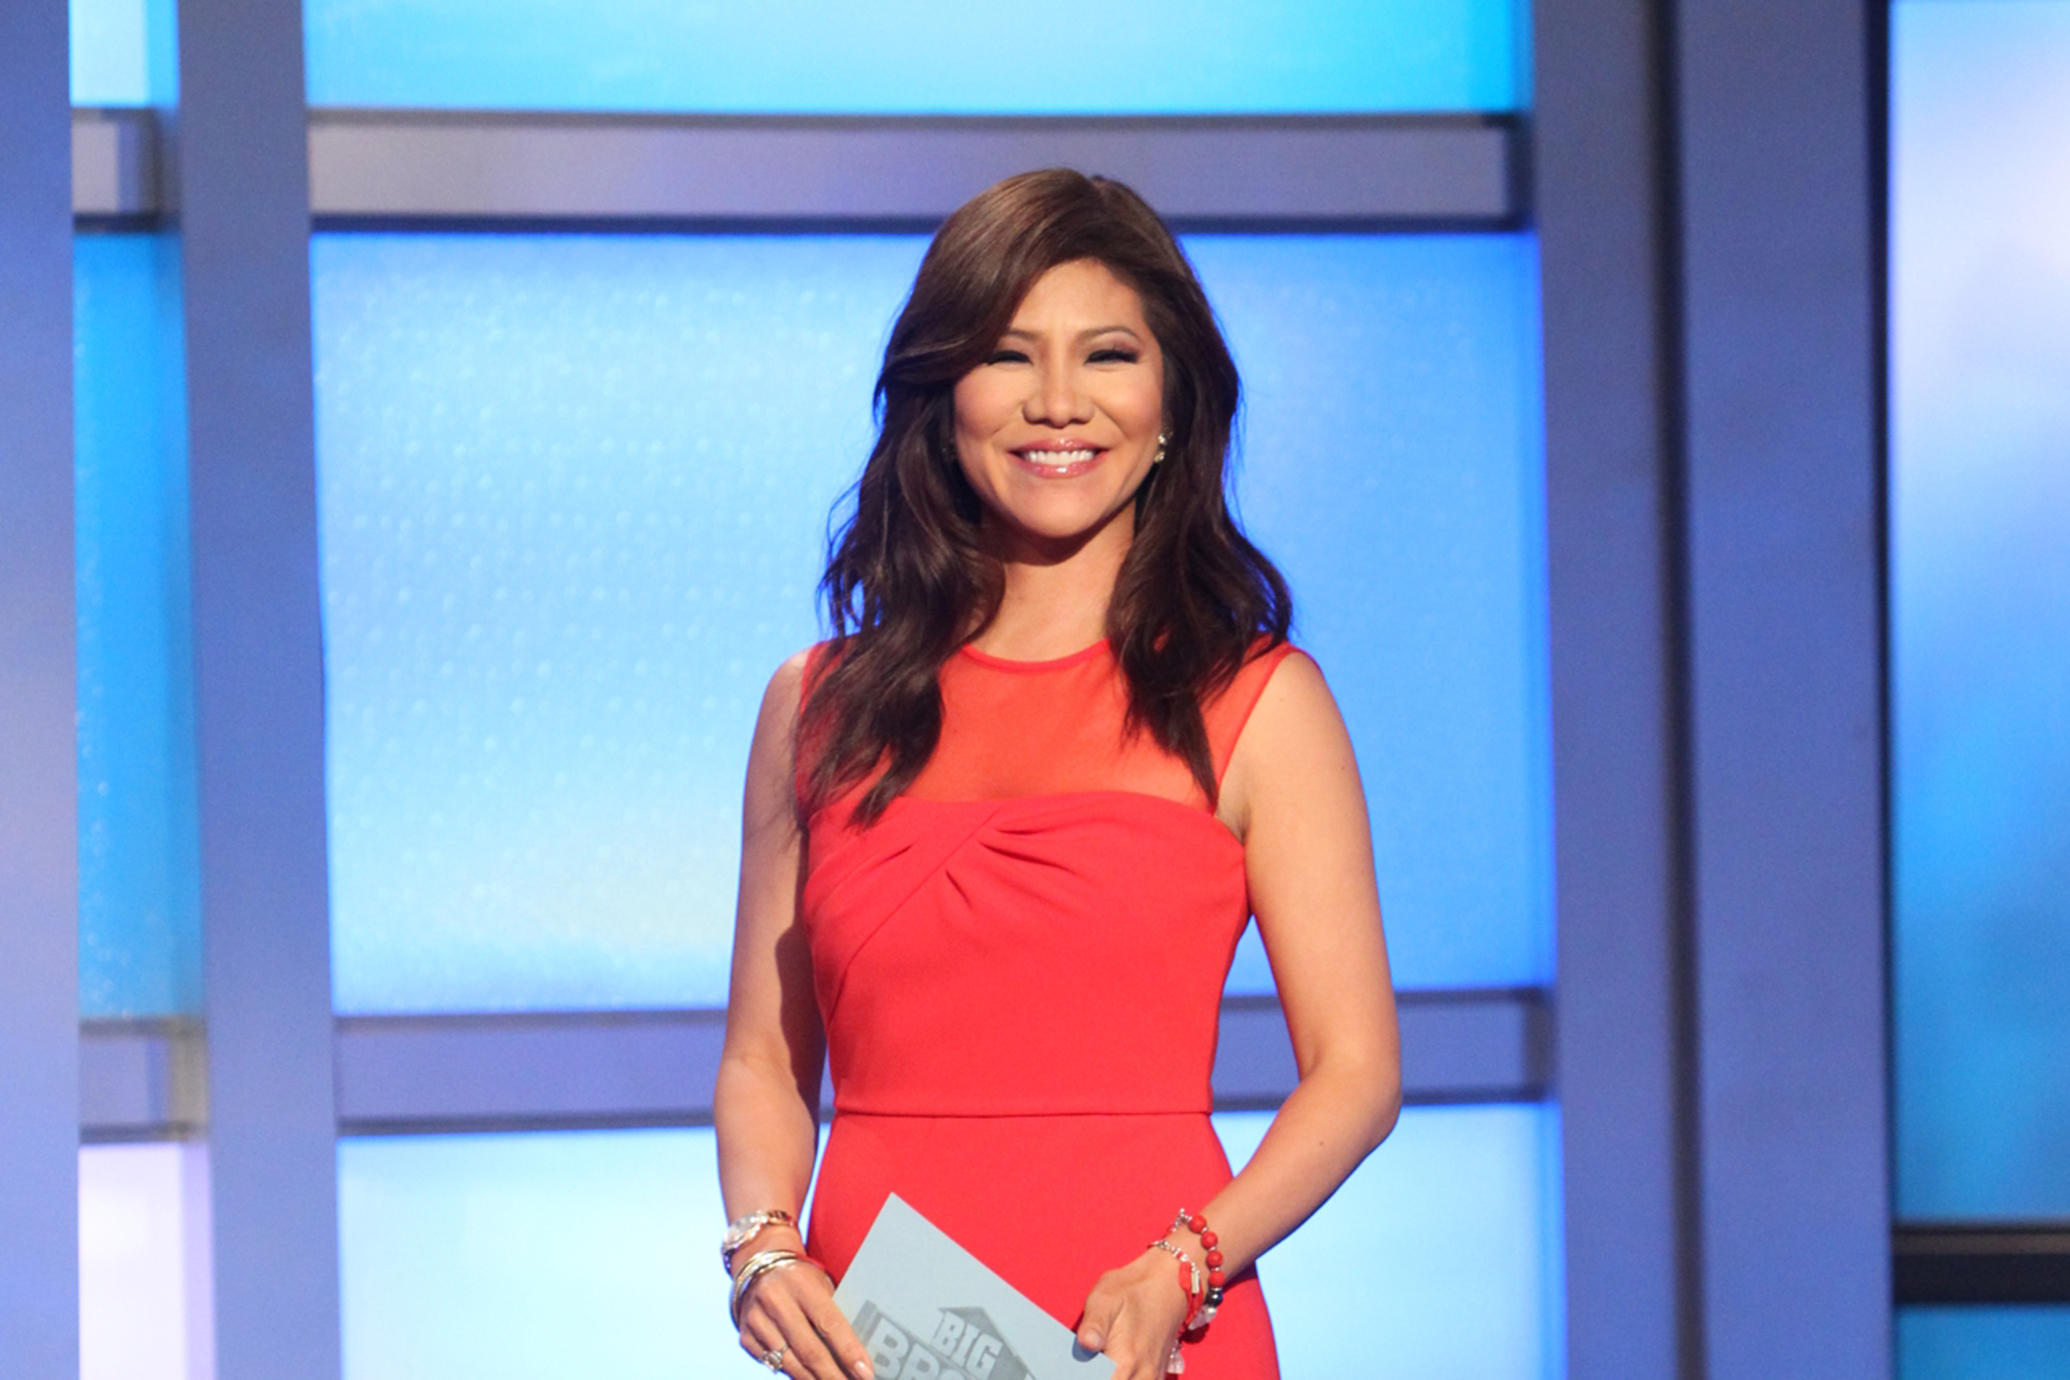 Julie Chen, Big Brother 22, Big Brother All Stars, CBS